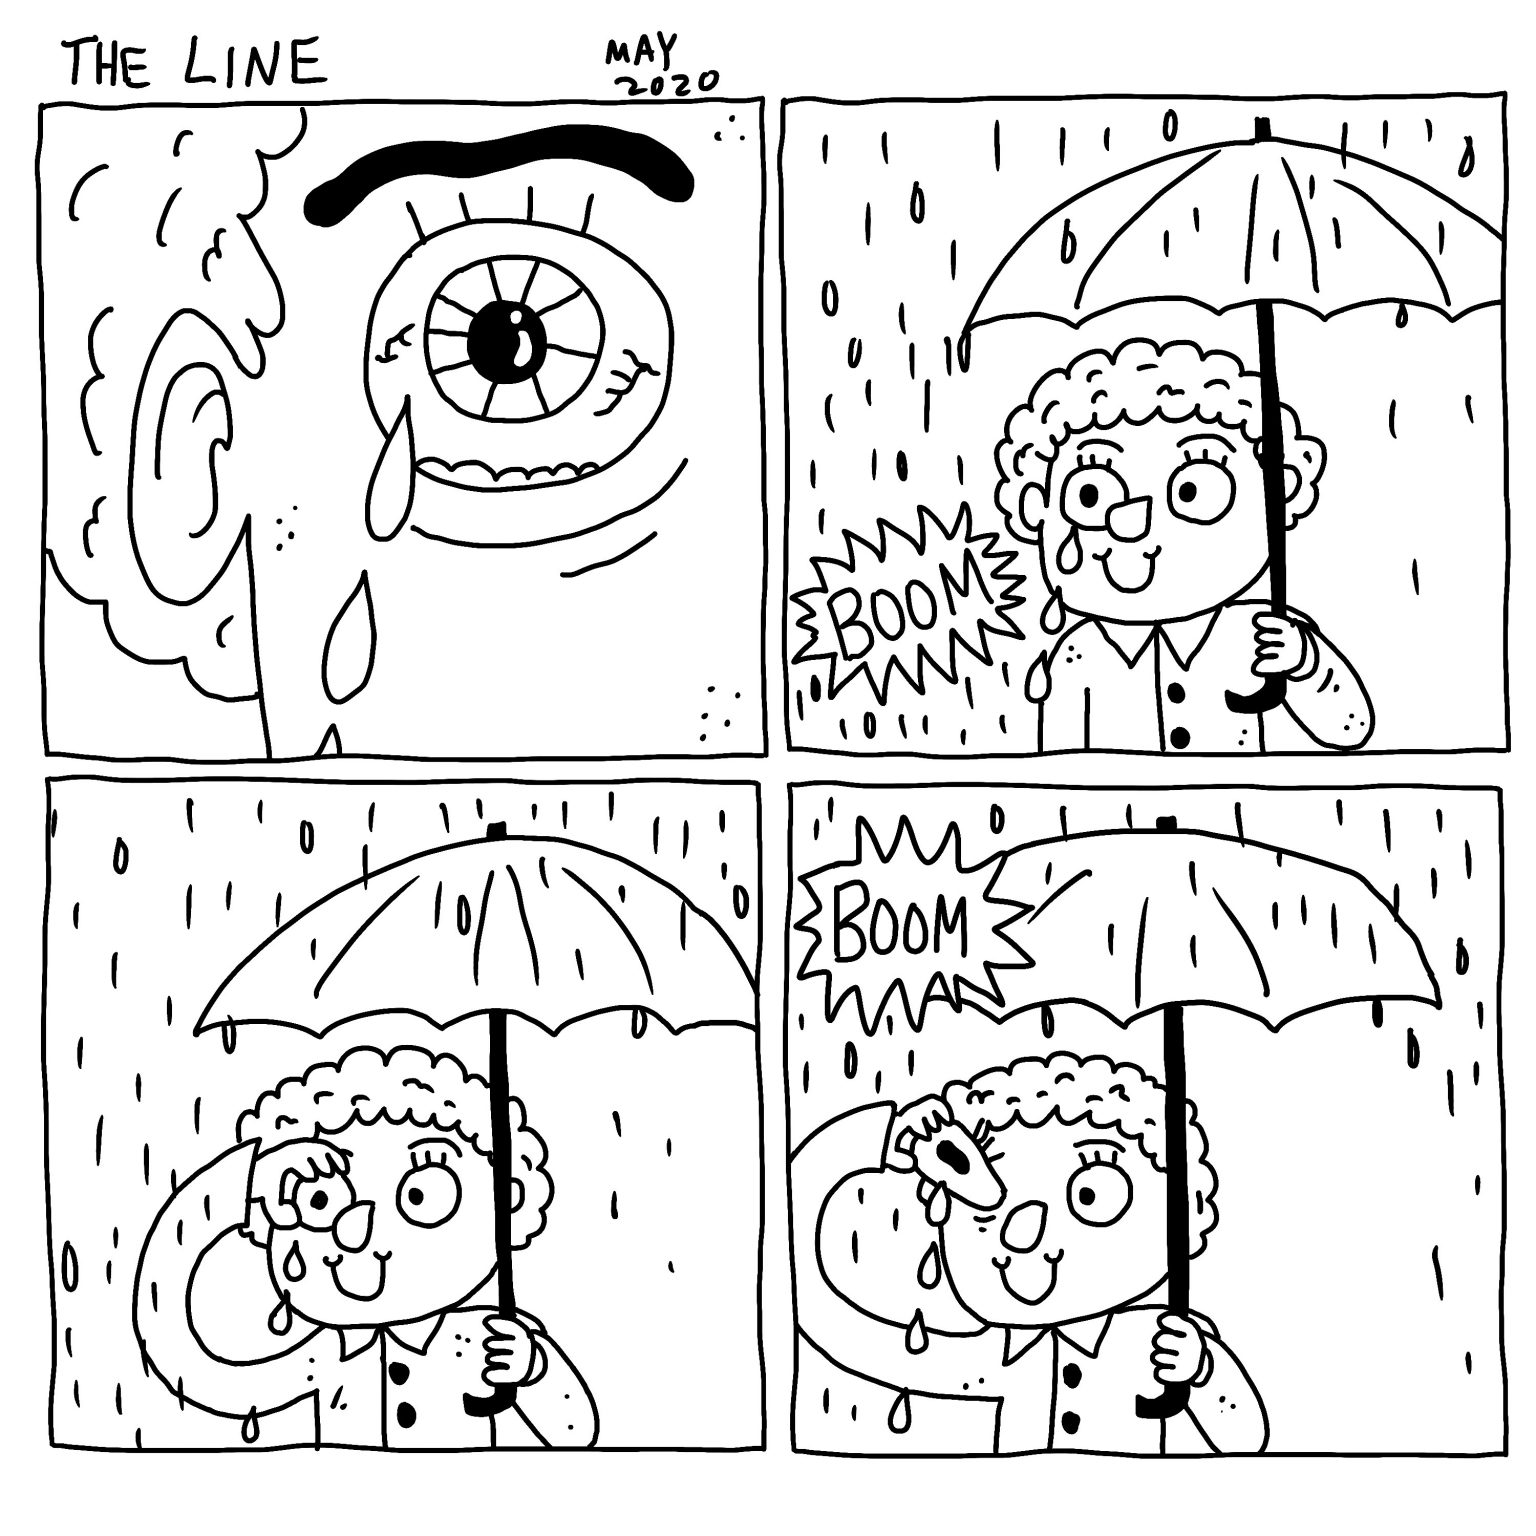 """THE LINE"" by Michael Seymour Blake"